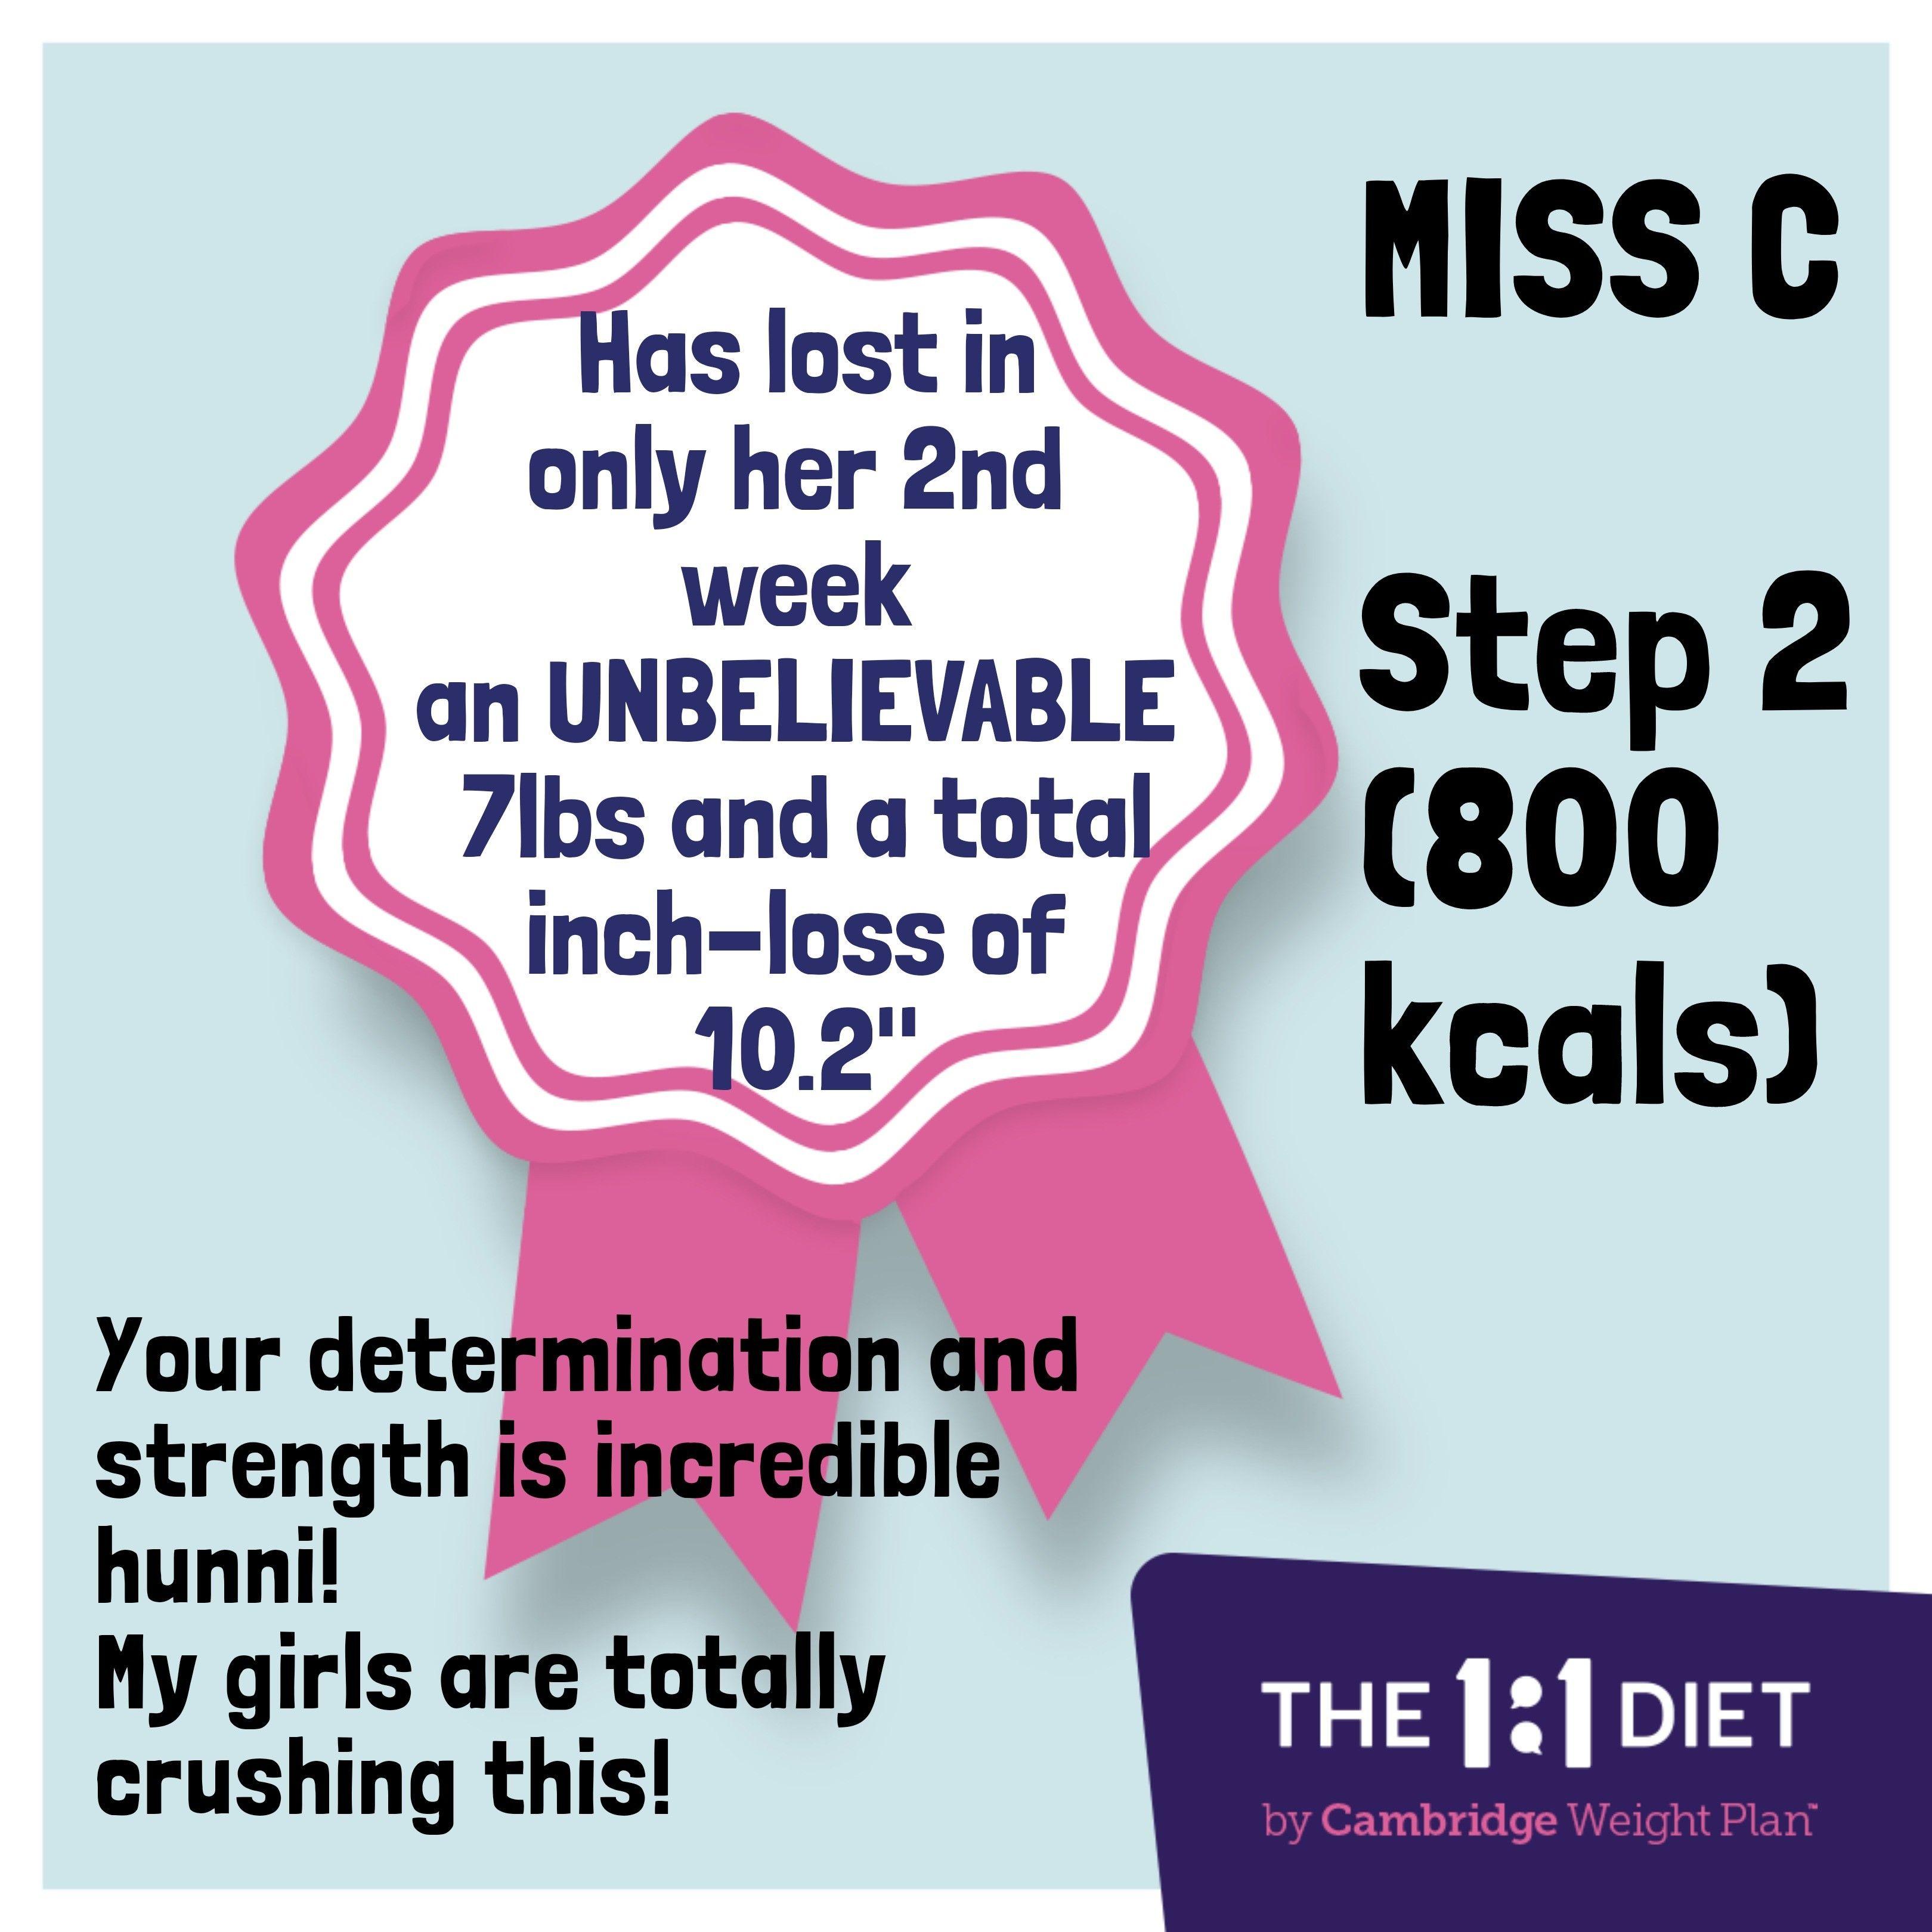 is the cambridge diet safe